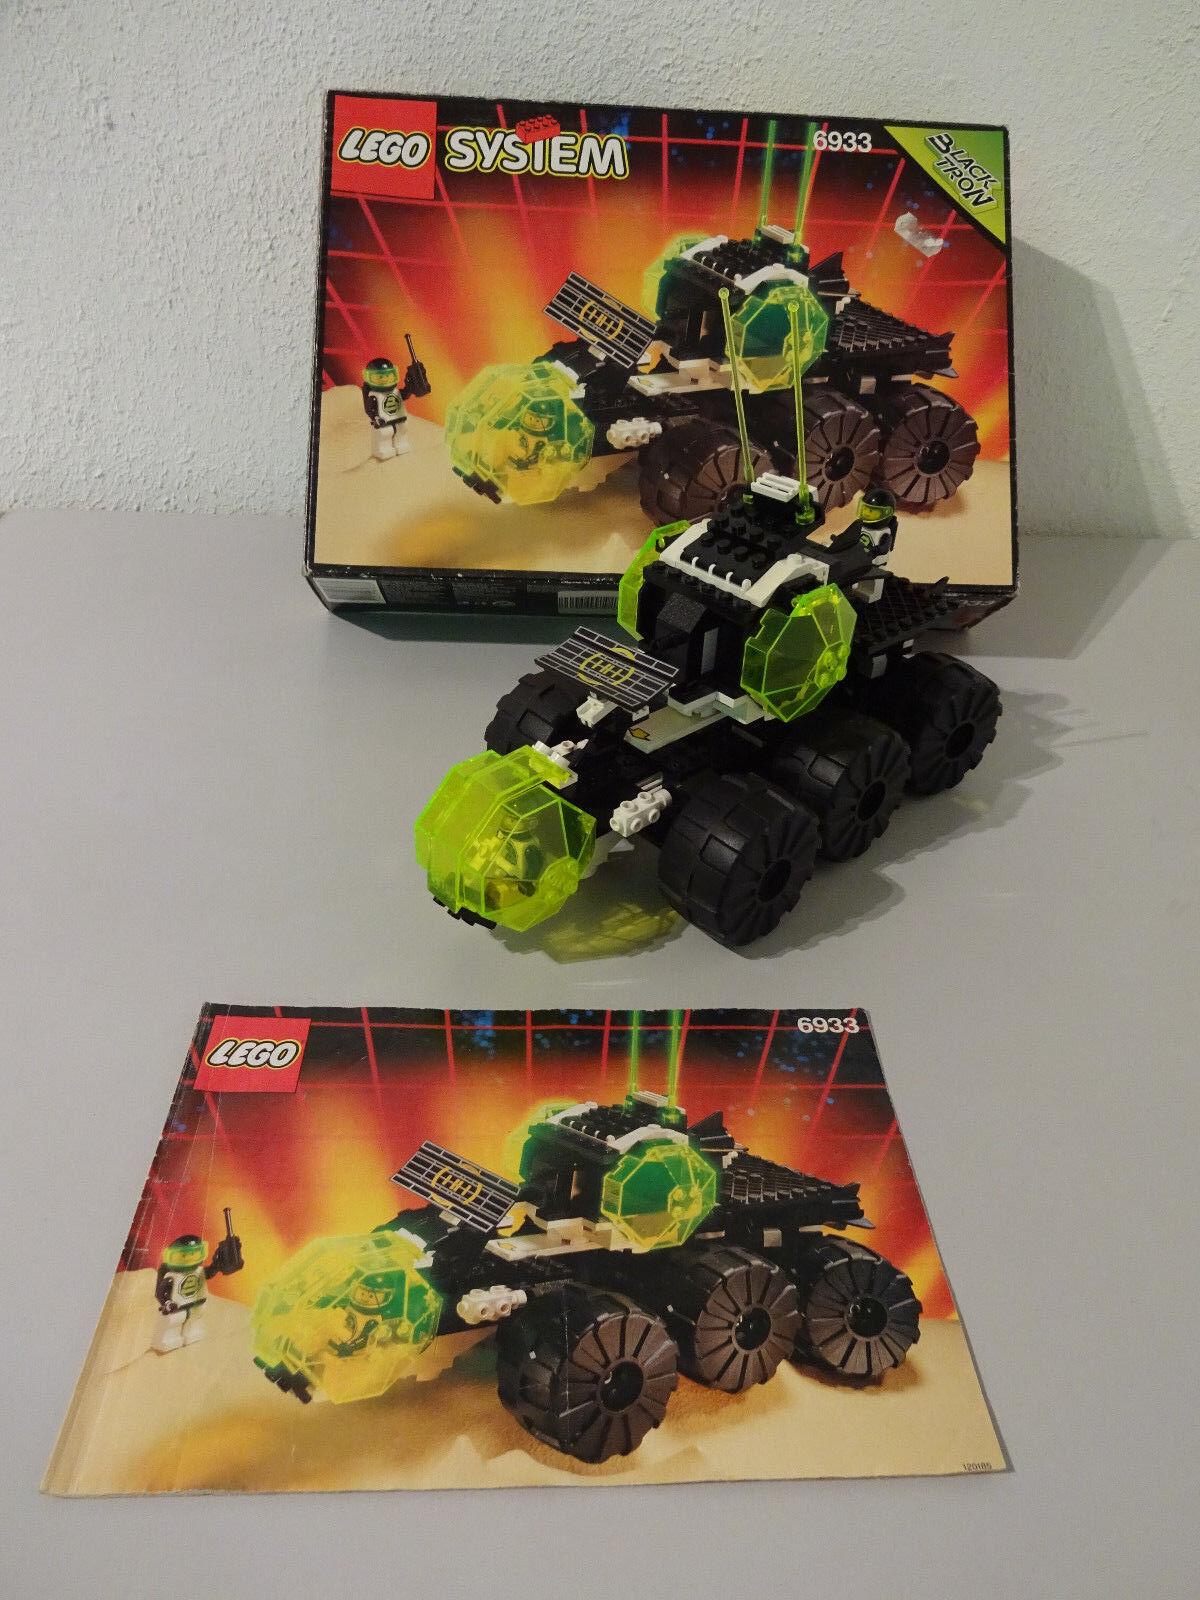 (TB) LEGO système 6933 Spectral Starguider avec emballage d'origine & Ba